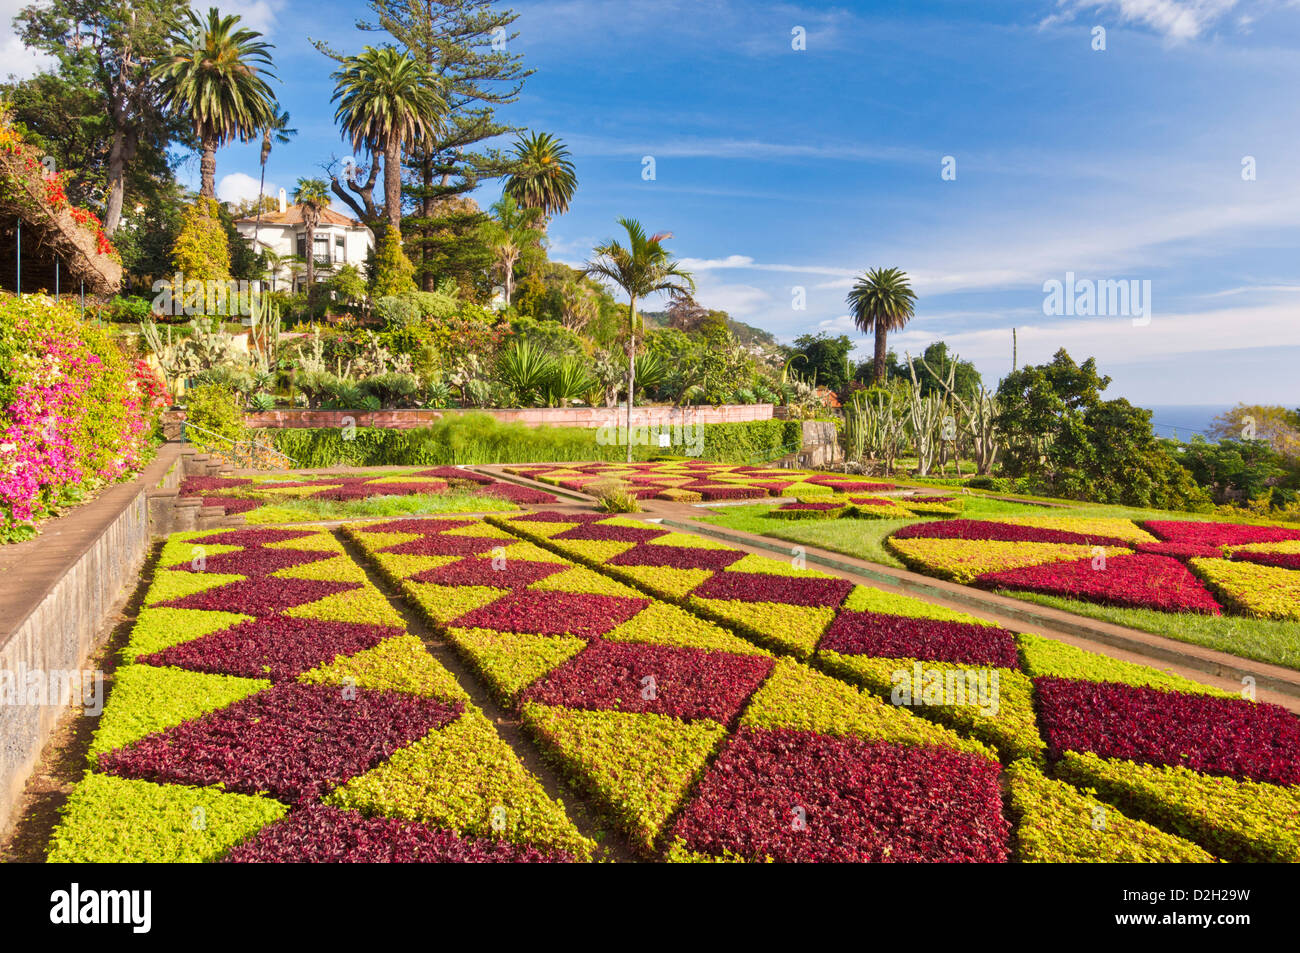 Garten Anzeige im Botanischen Garten Jardim Botanico Funchal Madeira Portugal EU Europa Stockbild